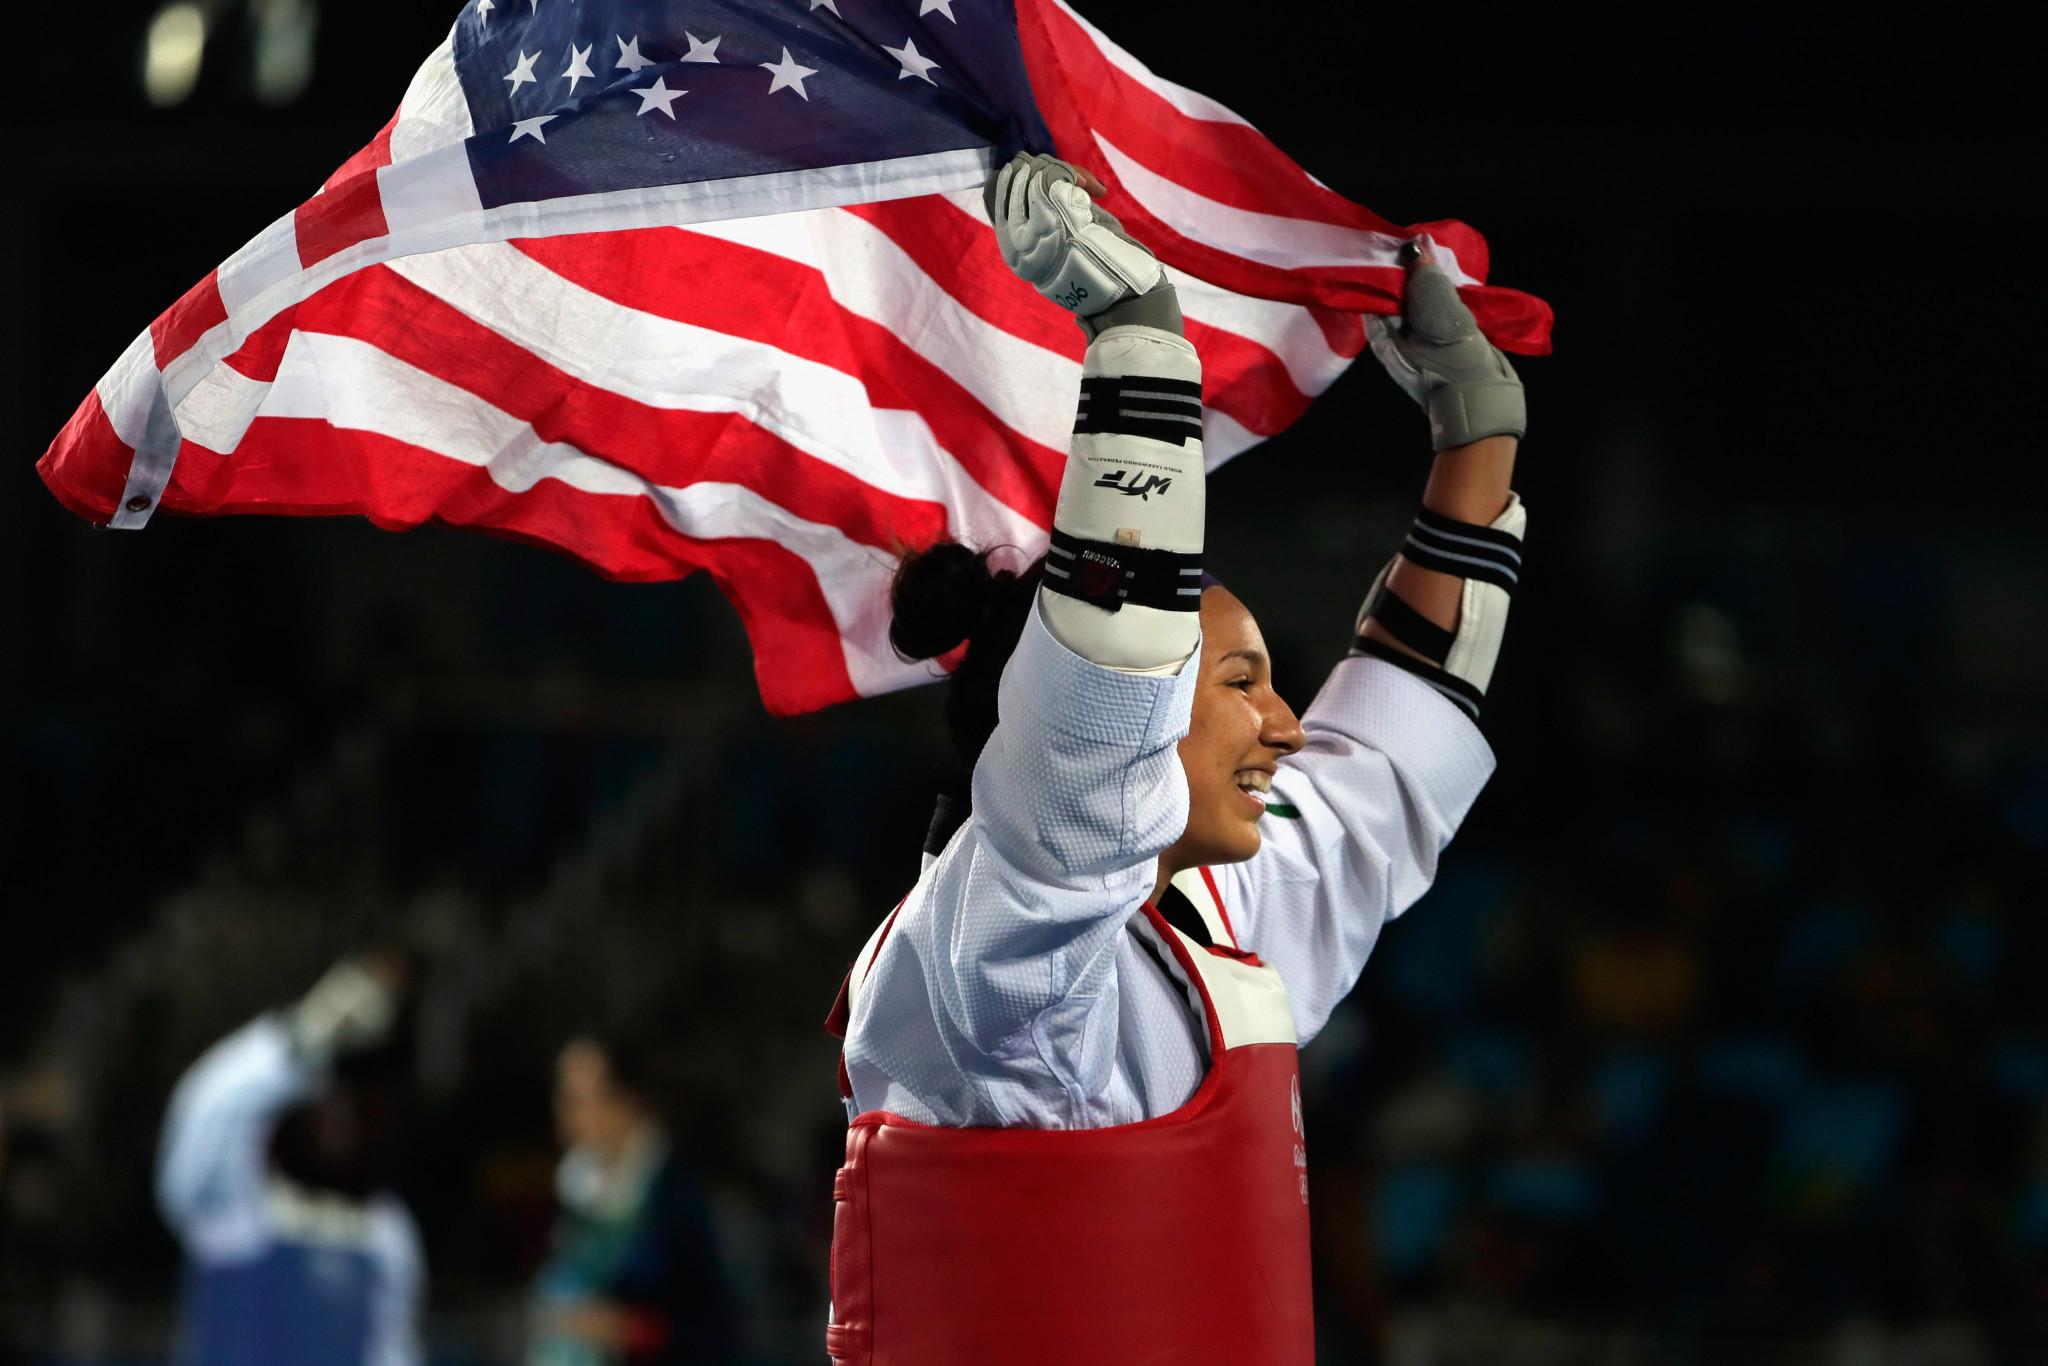 Jackie Galloway won the U.S. National Taekwondo Championships in 2013 ©Getty Images